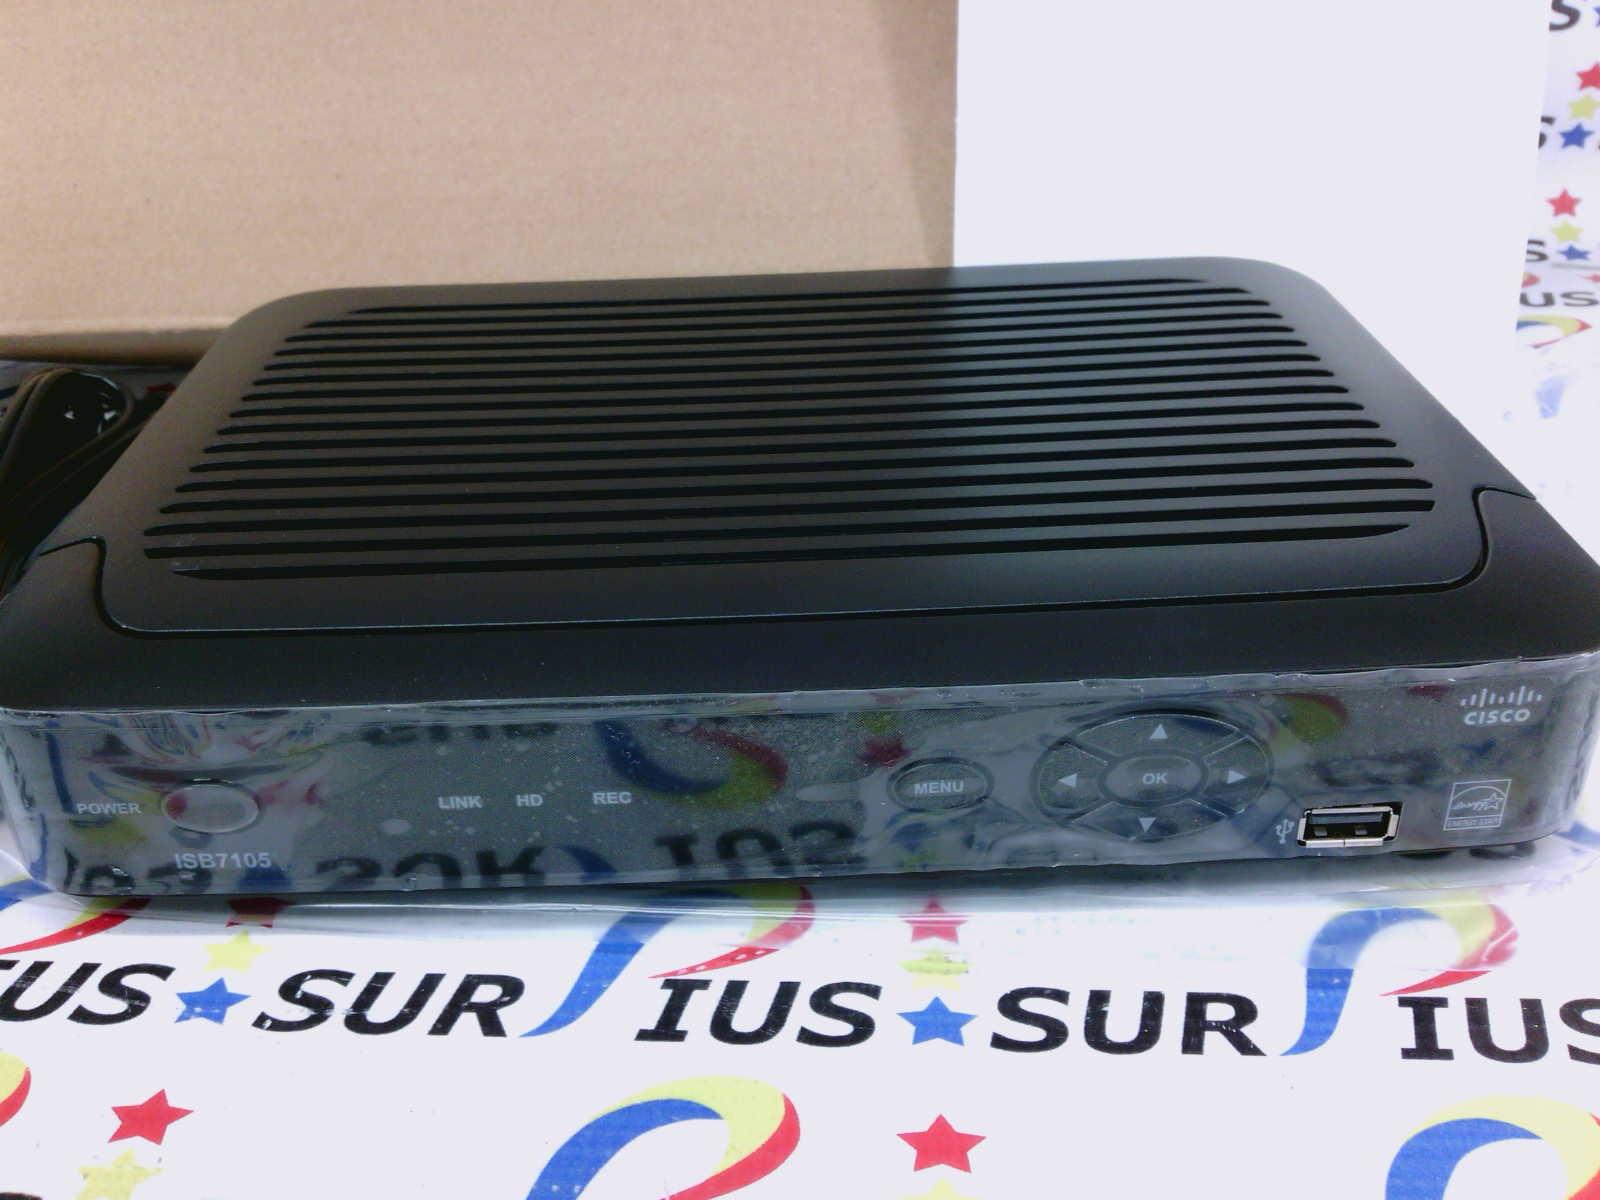 Cisco ISB7105 Wireless TV Receiver IPTV IP Set Top Box SD/HD WIFI 4044332